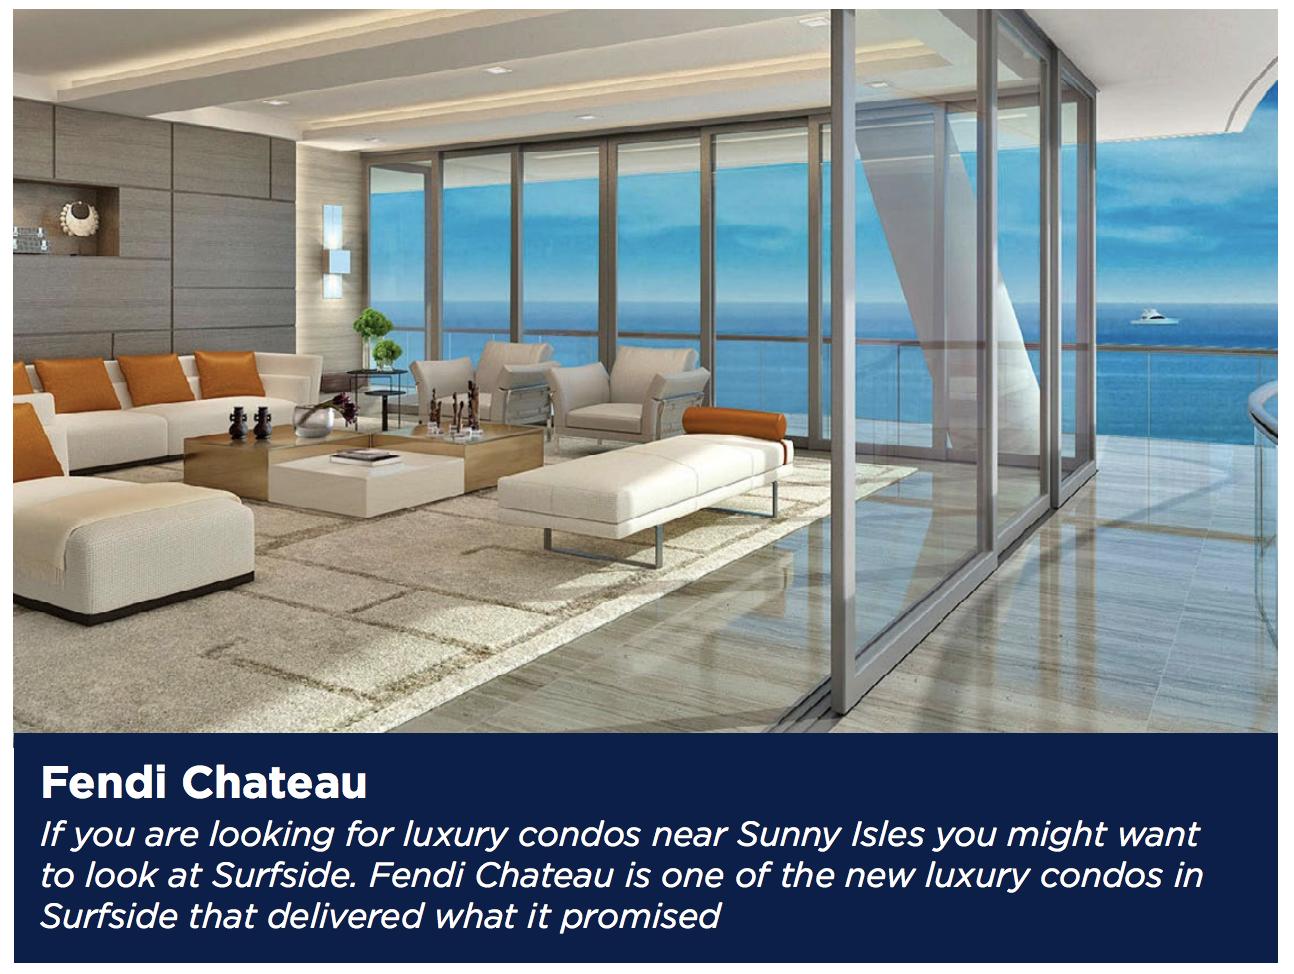 The 2018 Sunny Isles Beach Luxury Condo Report